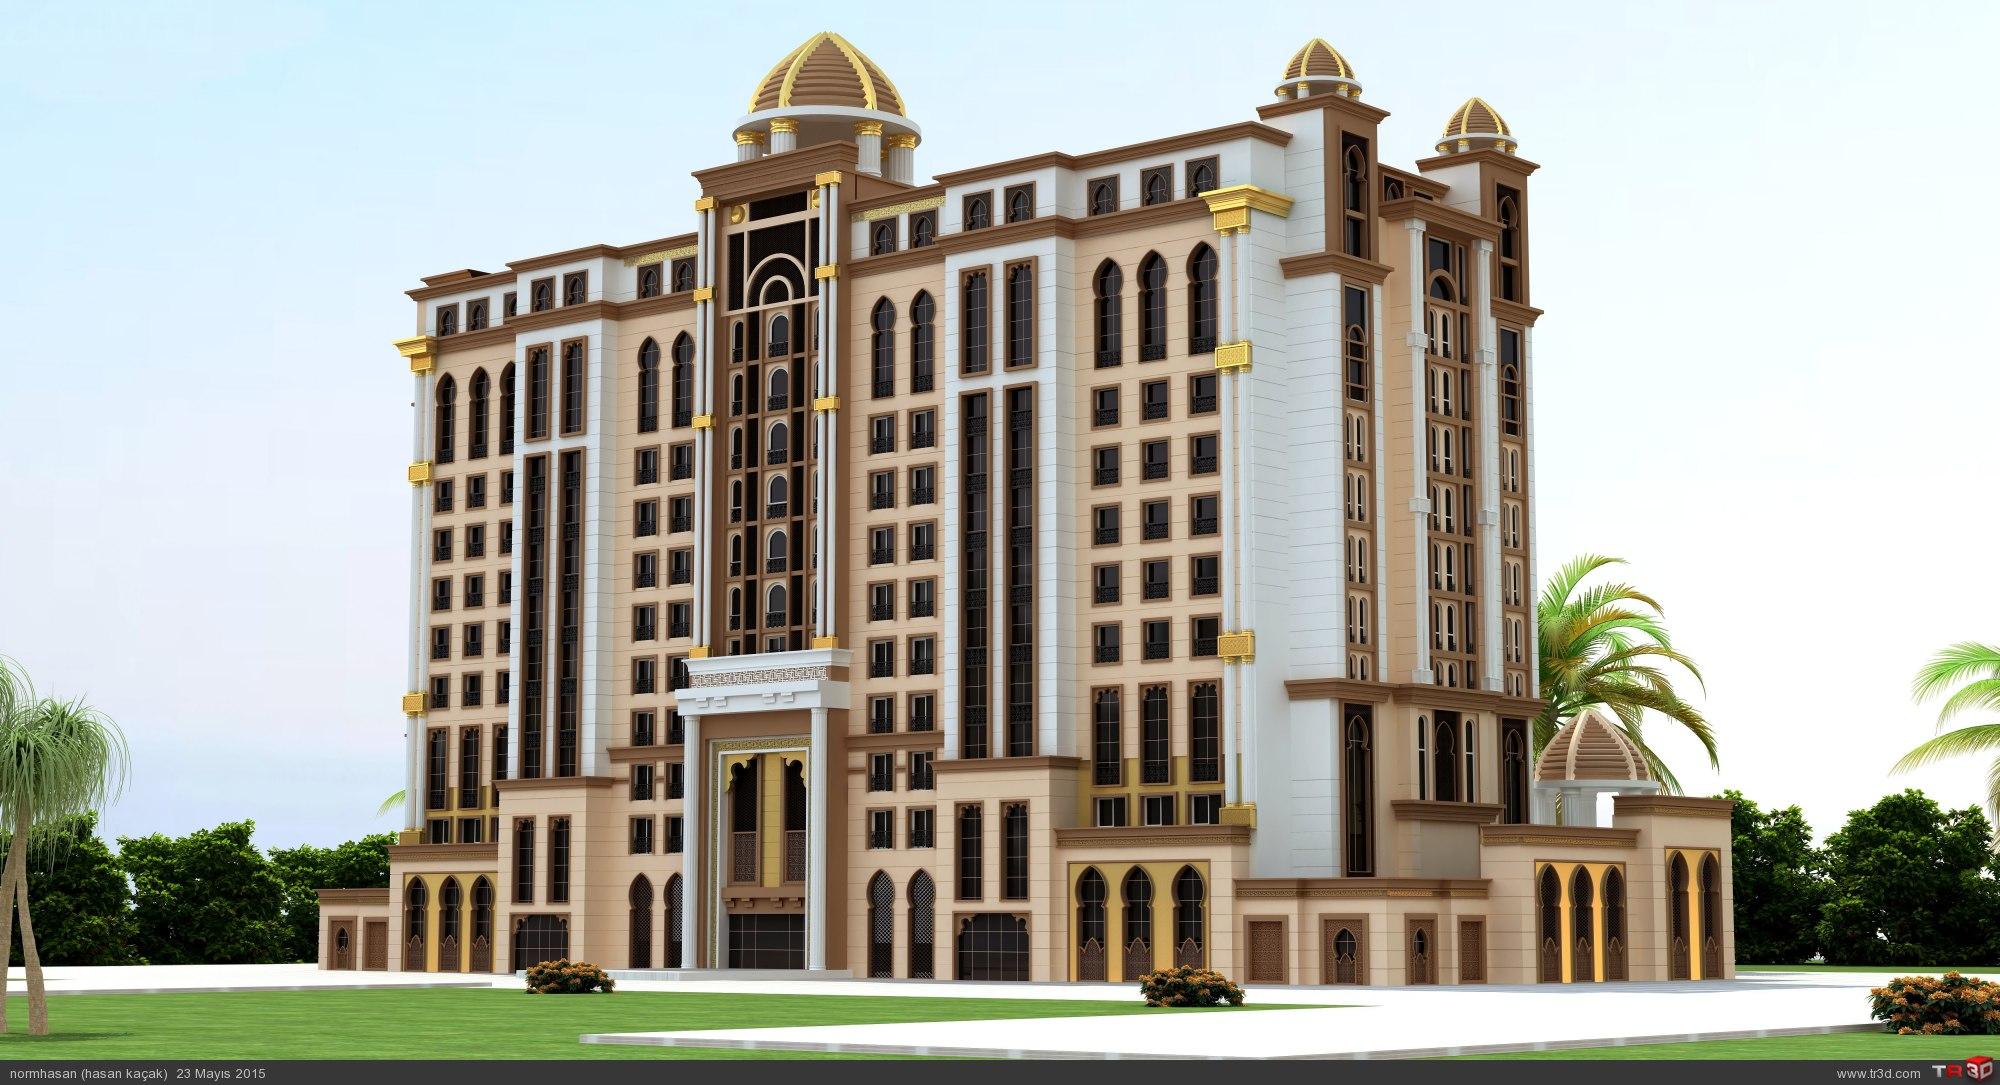 Emirates Arabic Kuvait 6